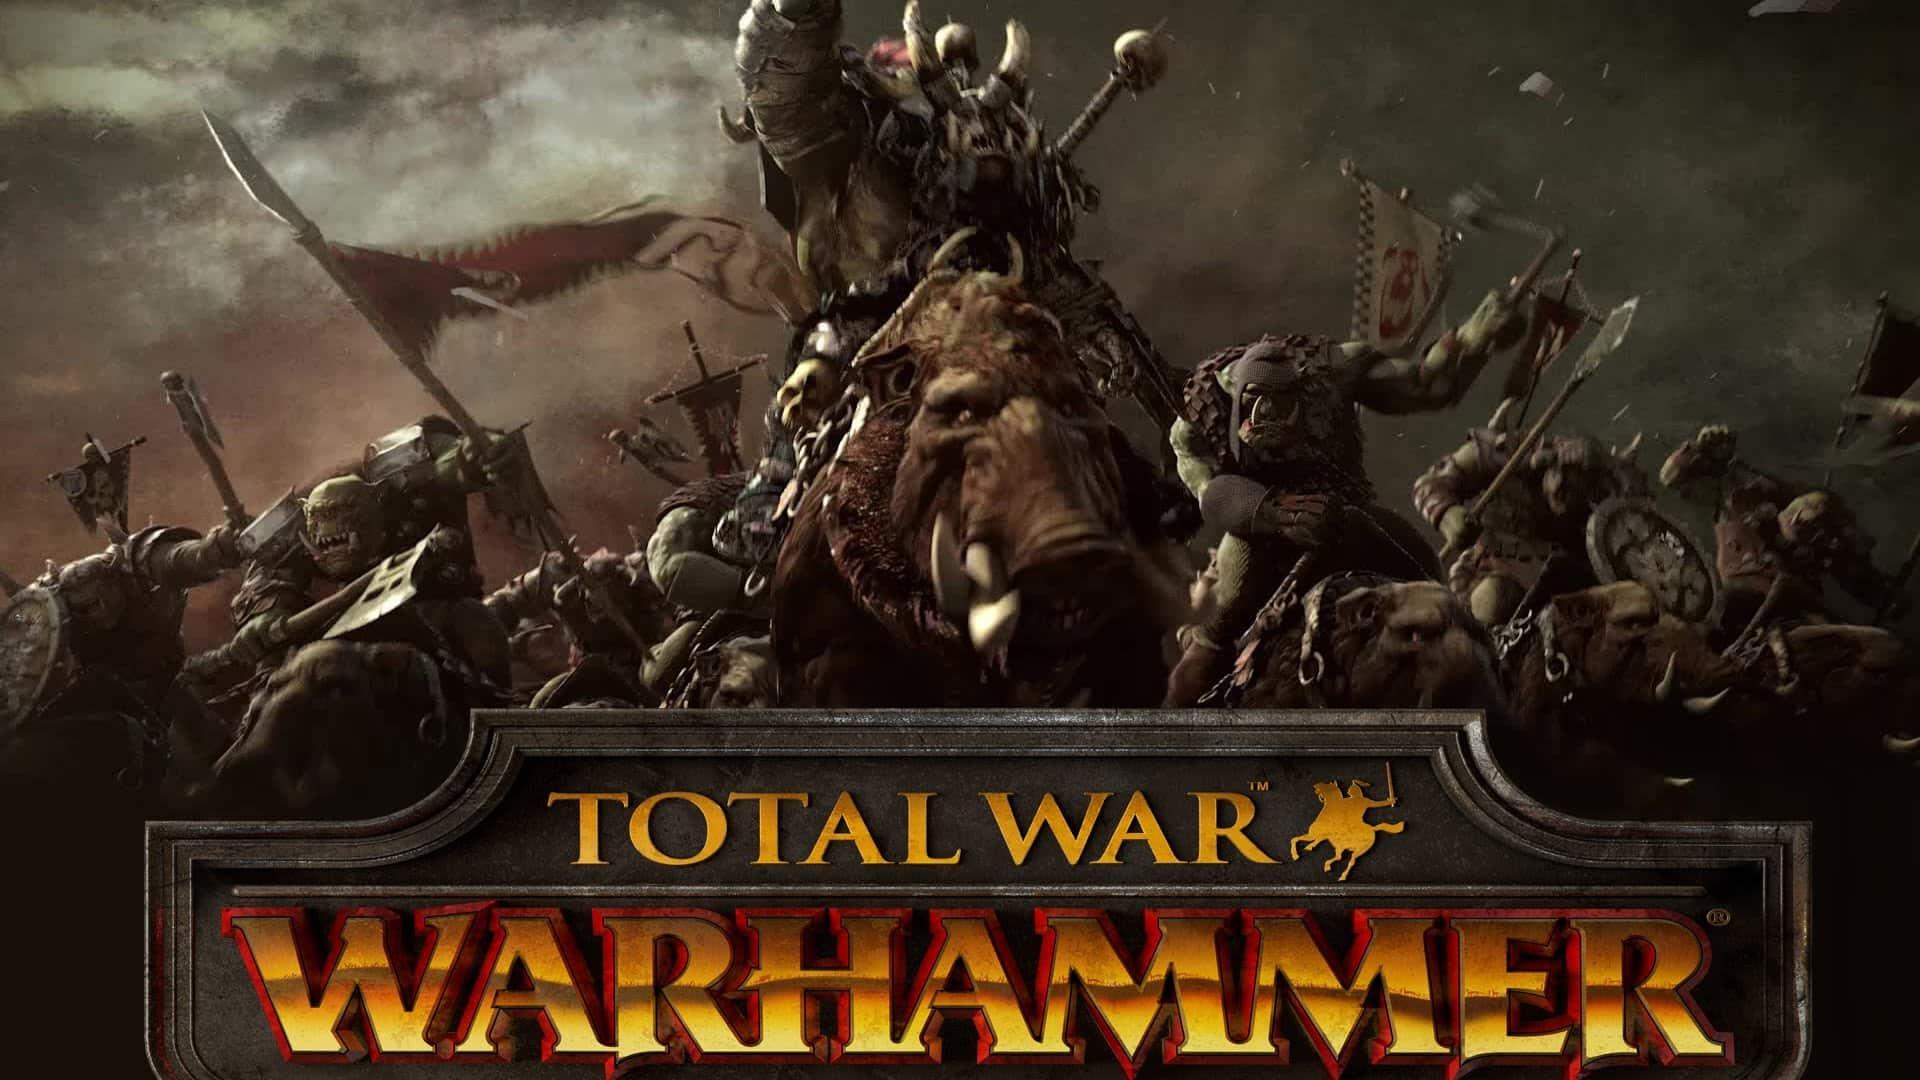 Total War Warhammer telecharger gratuit de PC et Torrent